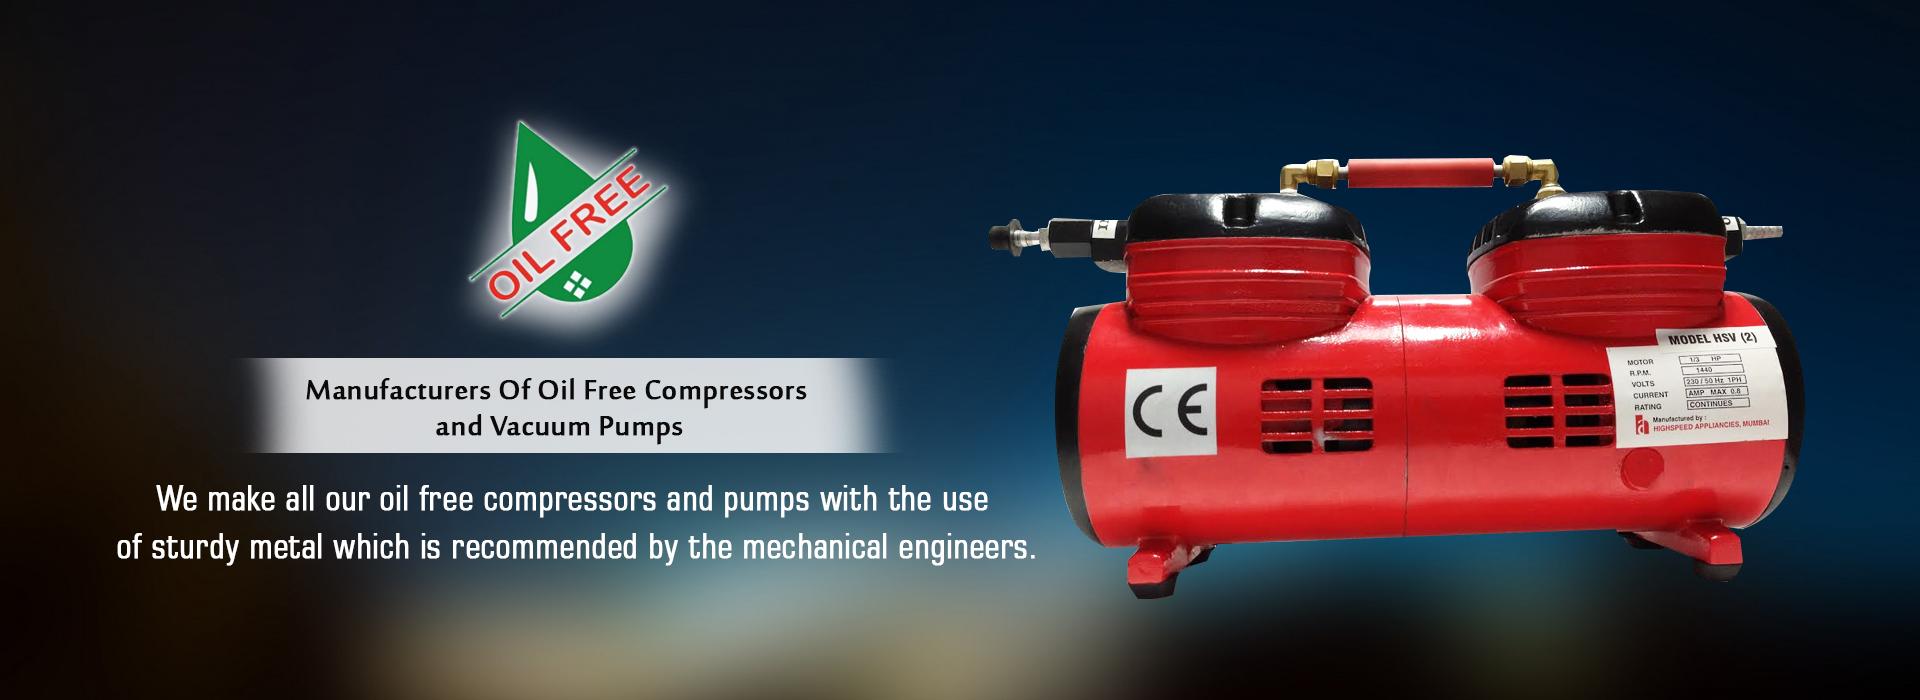 High Speed Appliances, Compressors, Vacuum Pump, Diaphragm